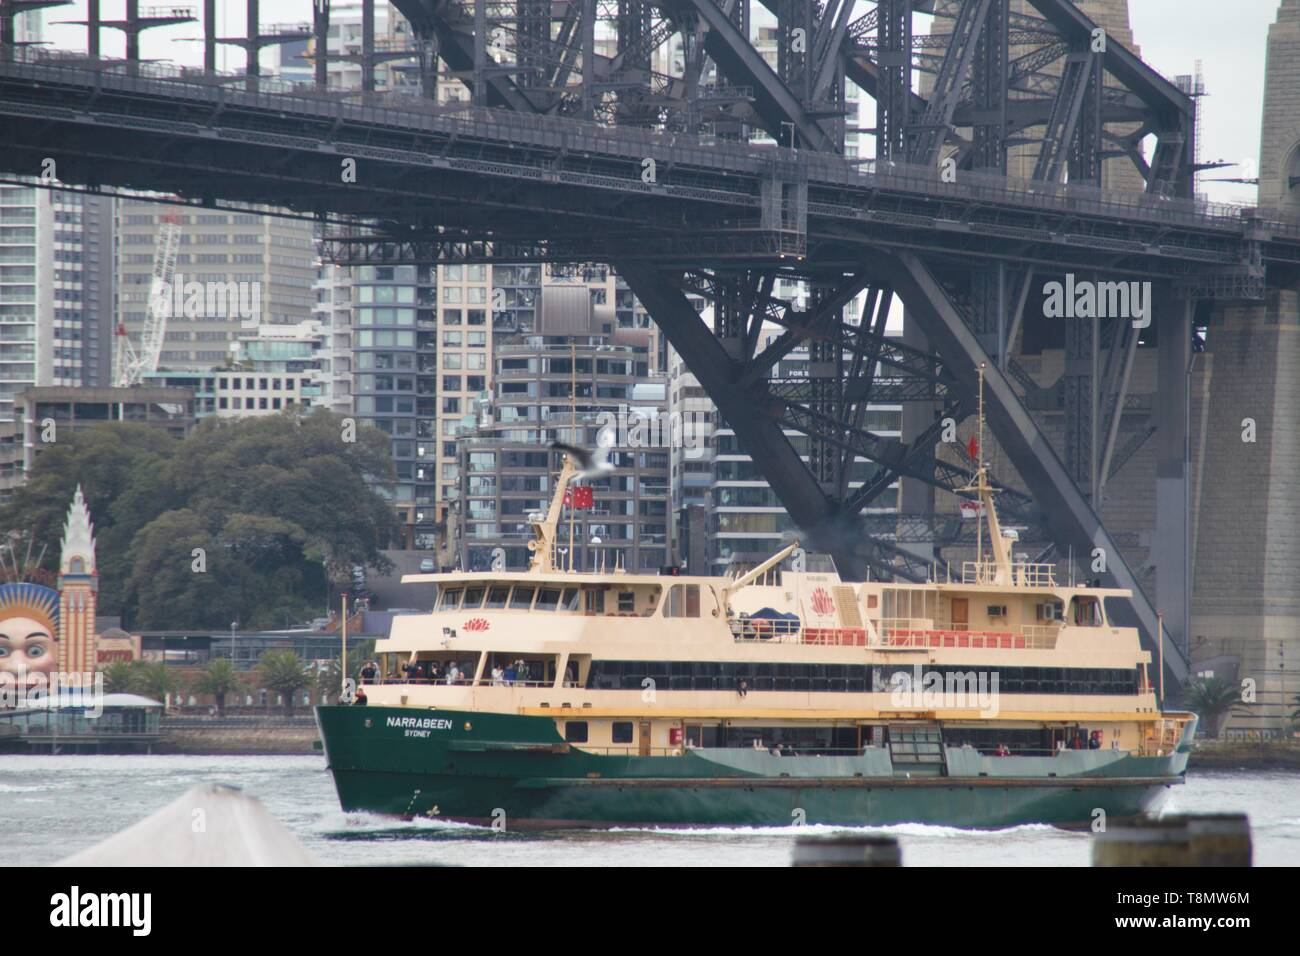 Big ferry boat under the Sydney harbour bridge - Stock Image